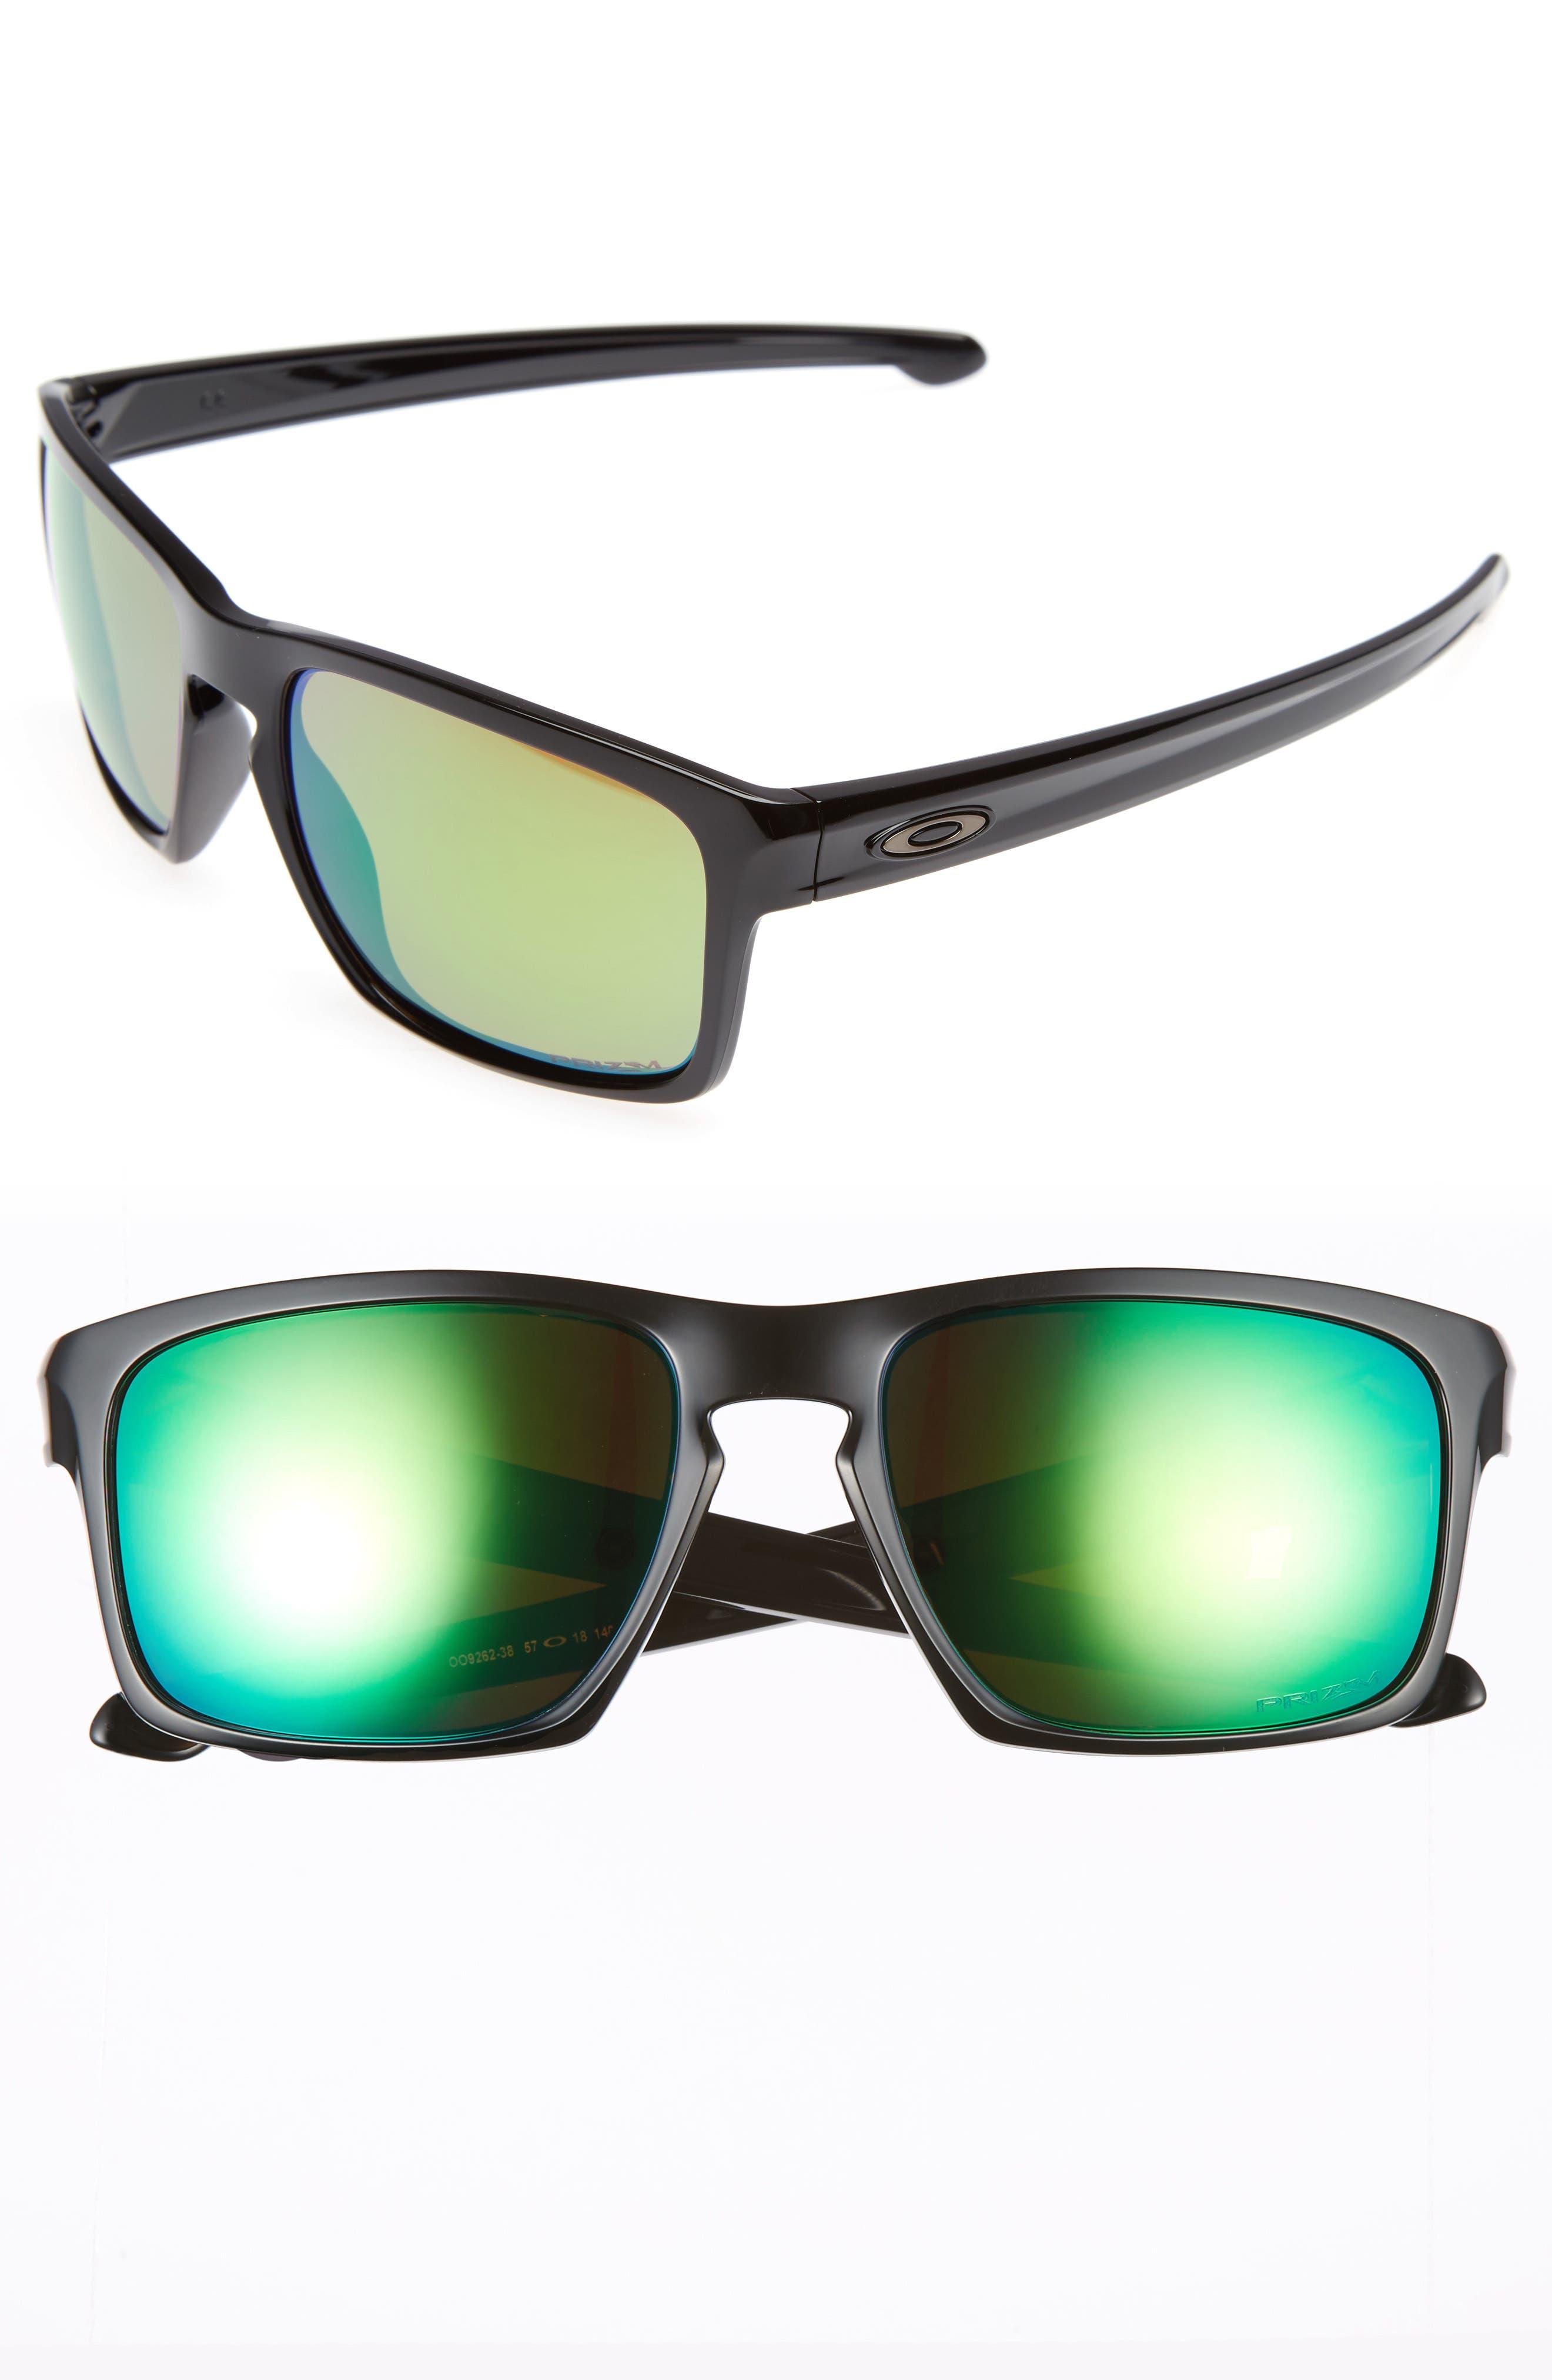 Oakley Sliver® H2O 57mm Polarized Sunglasses